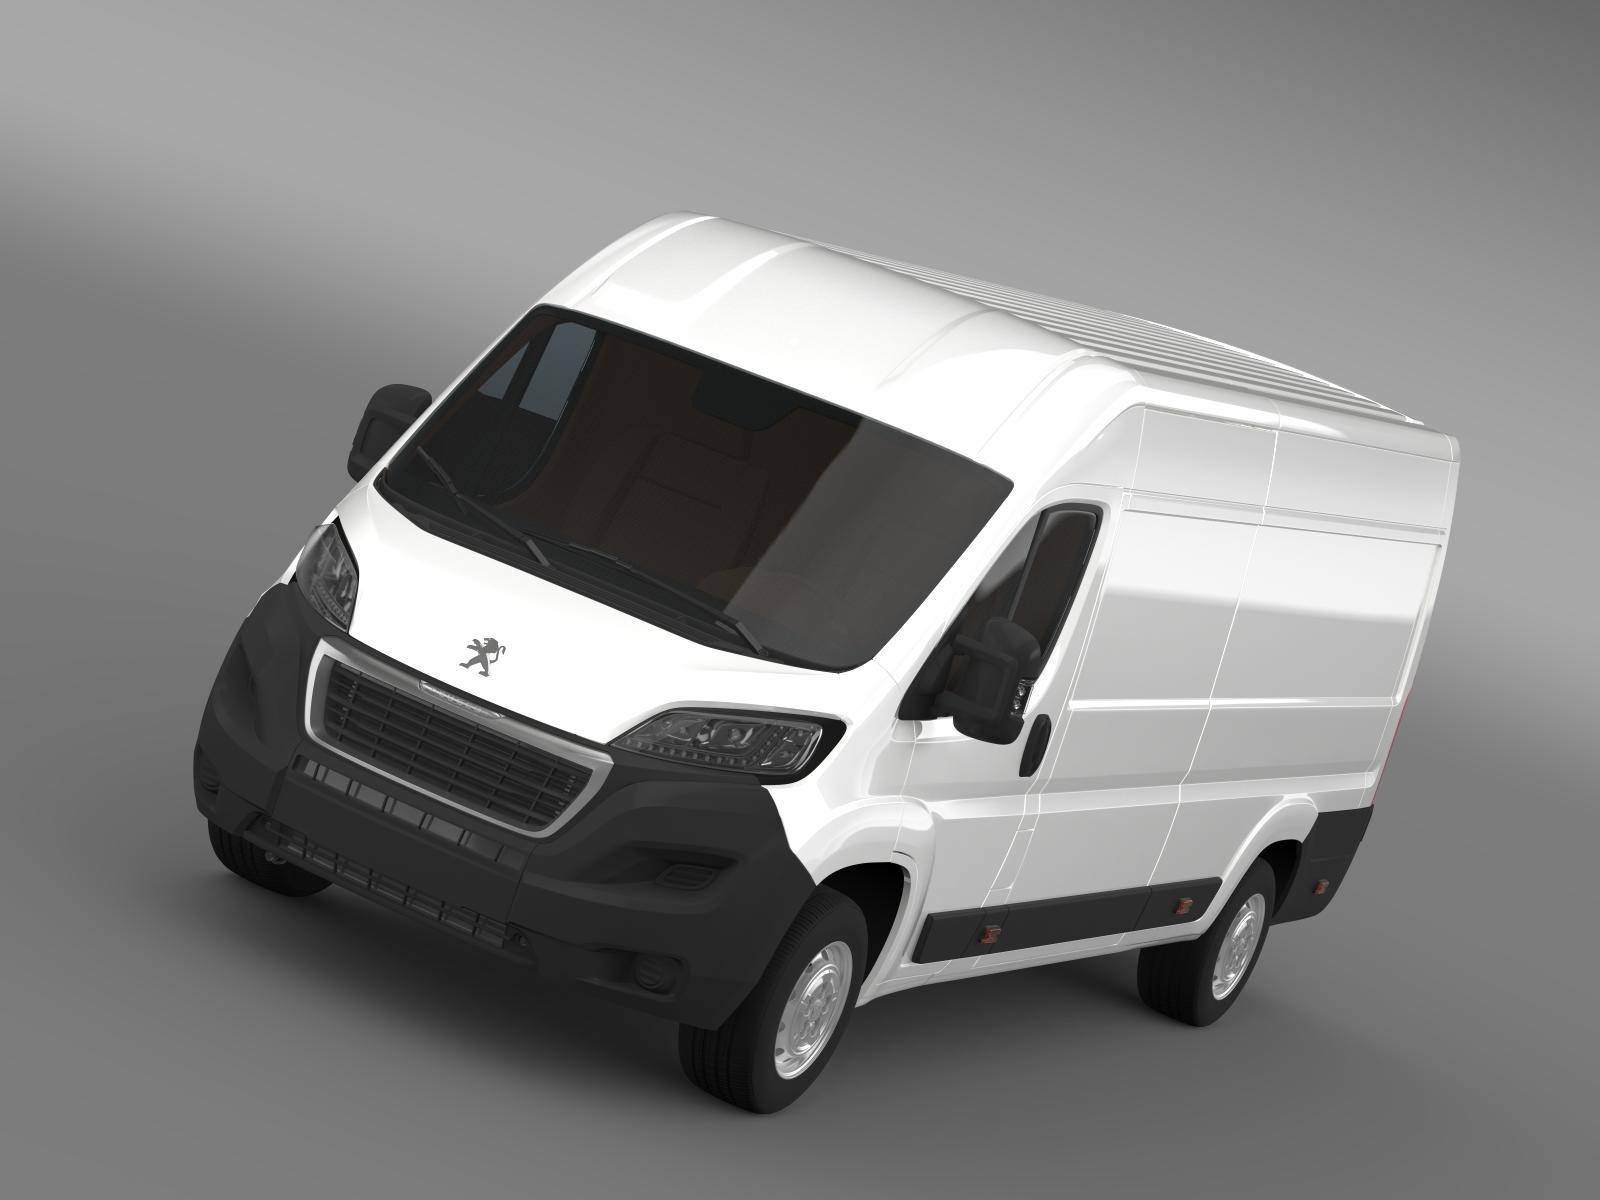 peugeot boxer furgons l4h2 2014 3d modelis 3ds max fbx c4d lwo ma mb hrc xsi obj 203103